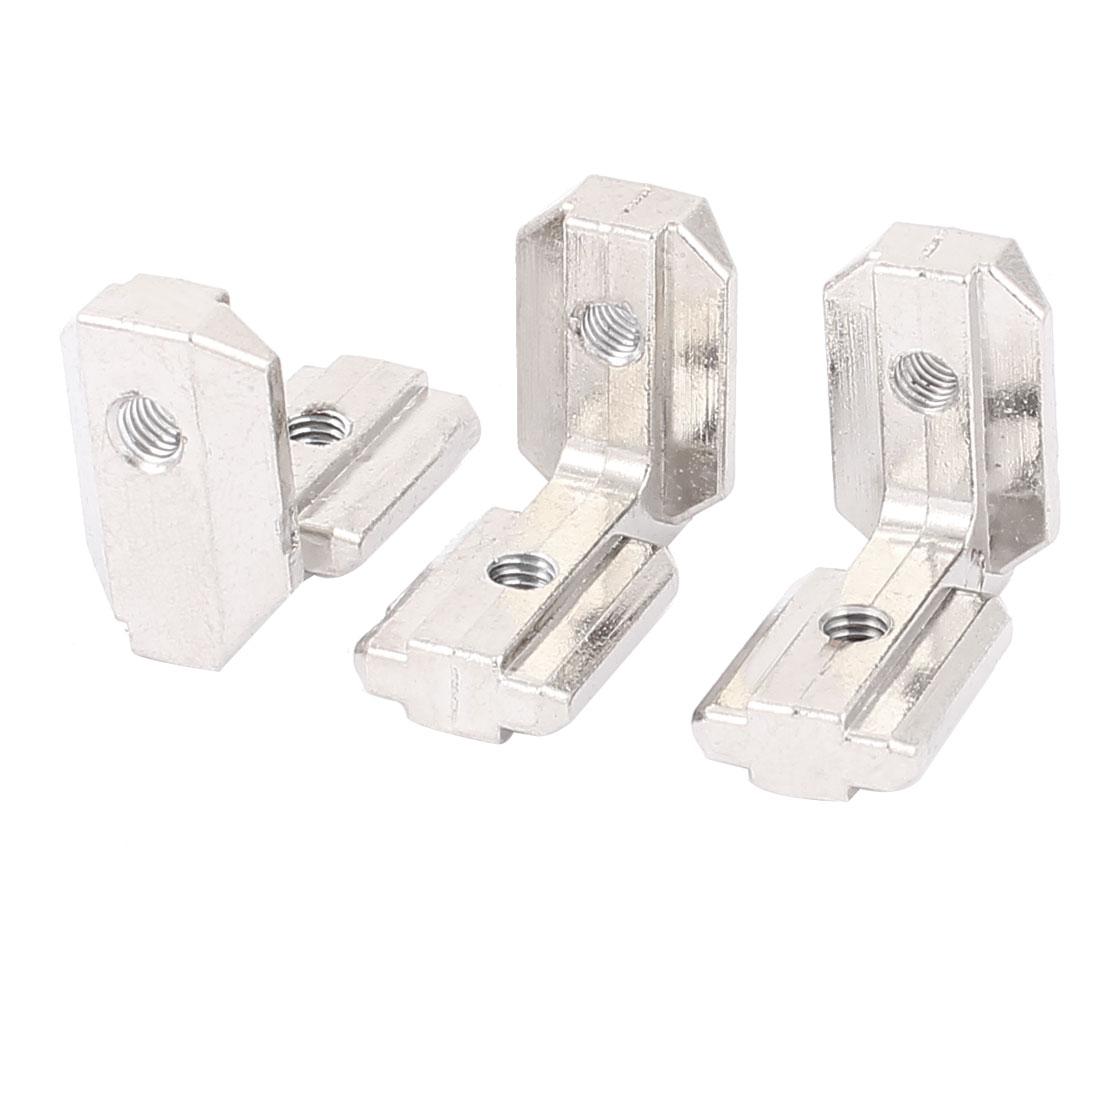 T Slot 90 Degree Stainless Steel Hidden Corner Connectors 3pcs